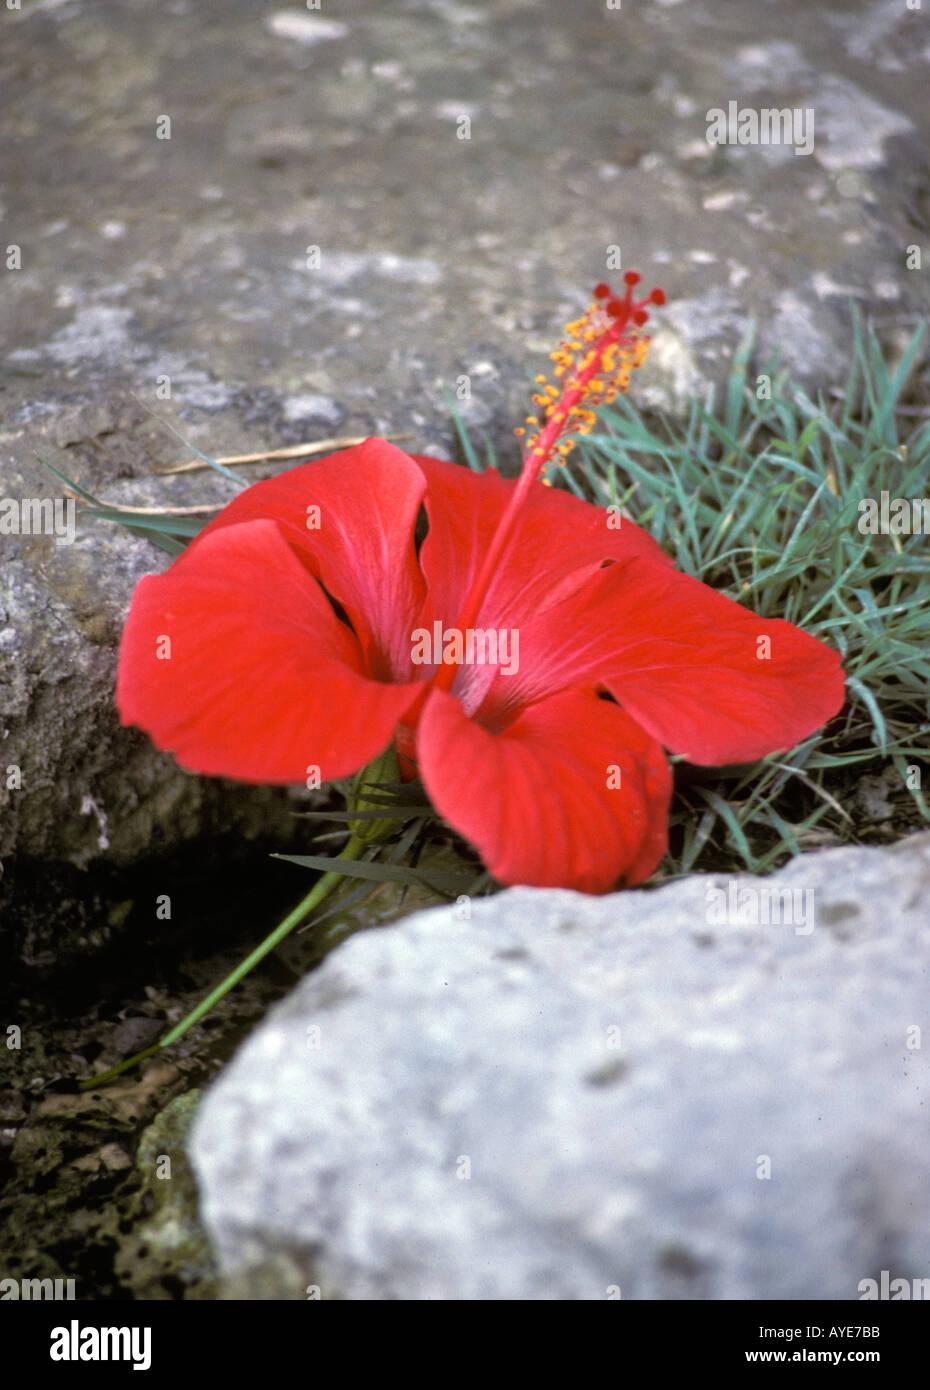 Hibiscus Flower Red Flower Greek Stock Photos Hibiscus Flower Red